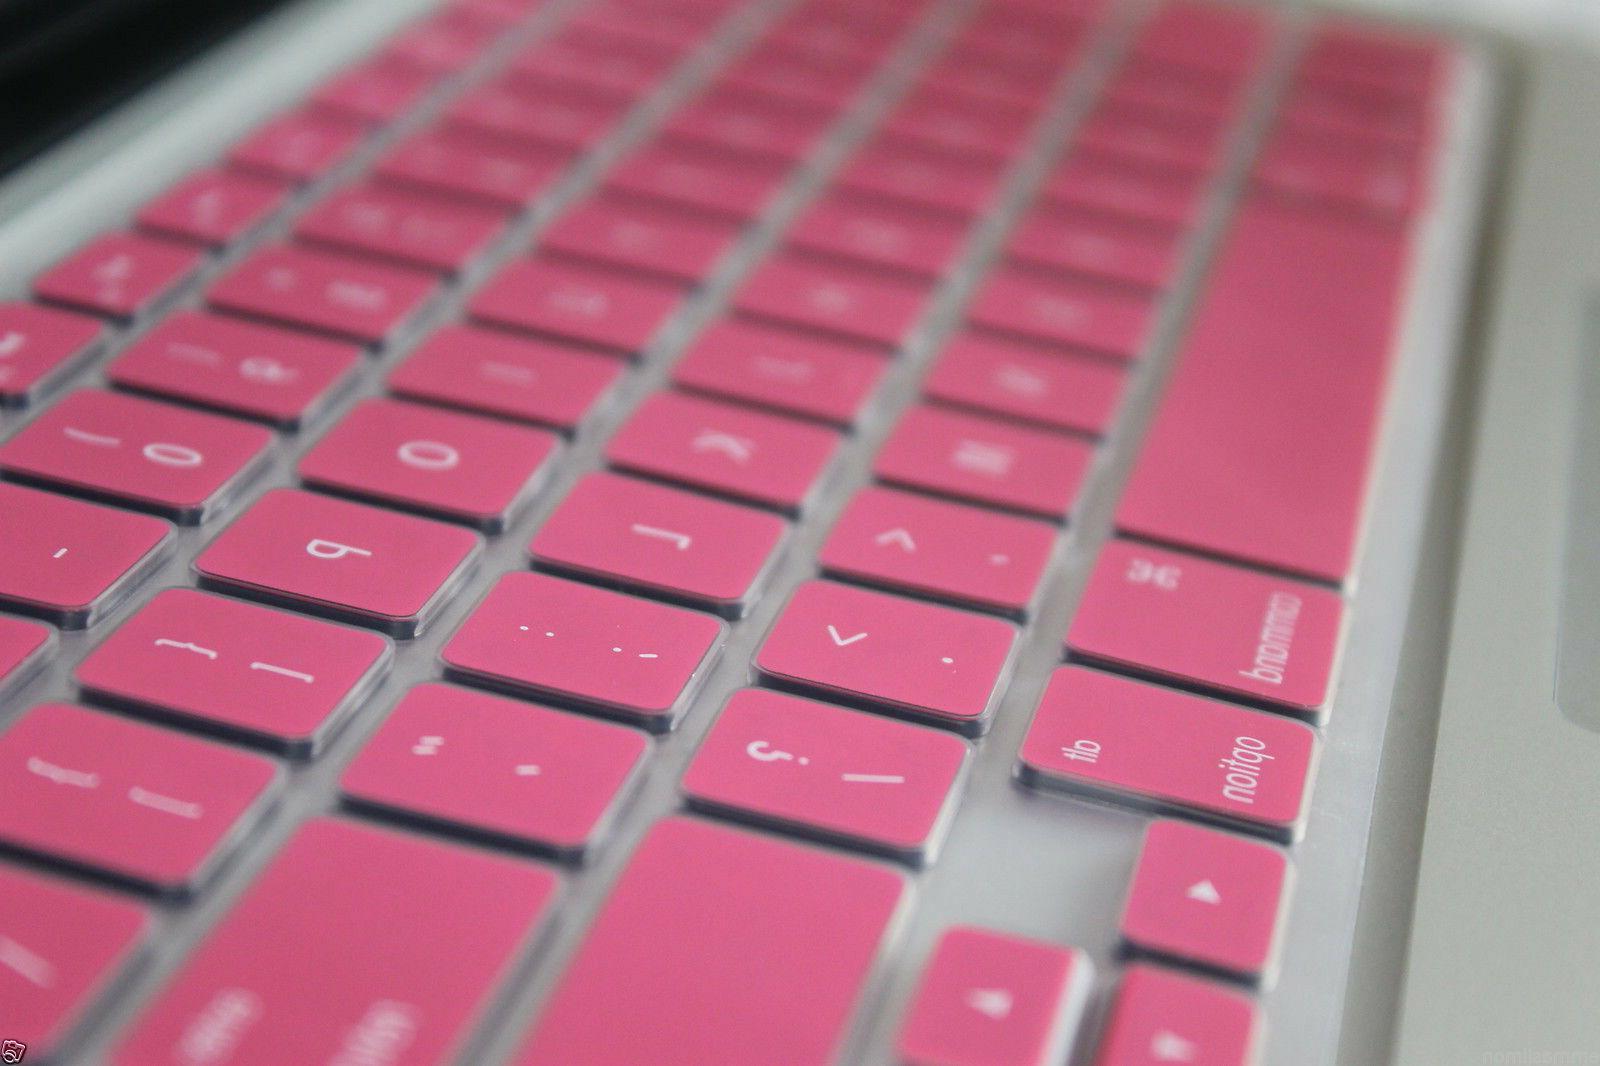 Babypink TPU Keyboard Cover Skin for  APPLE Wireless Keyboard